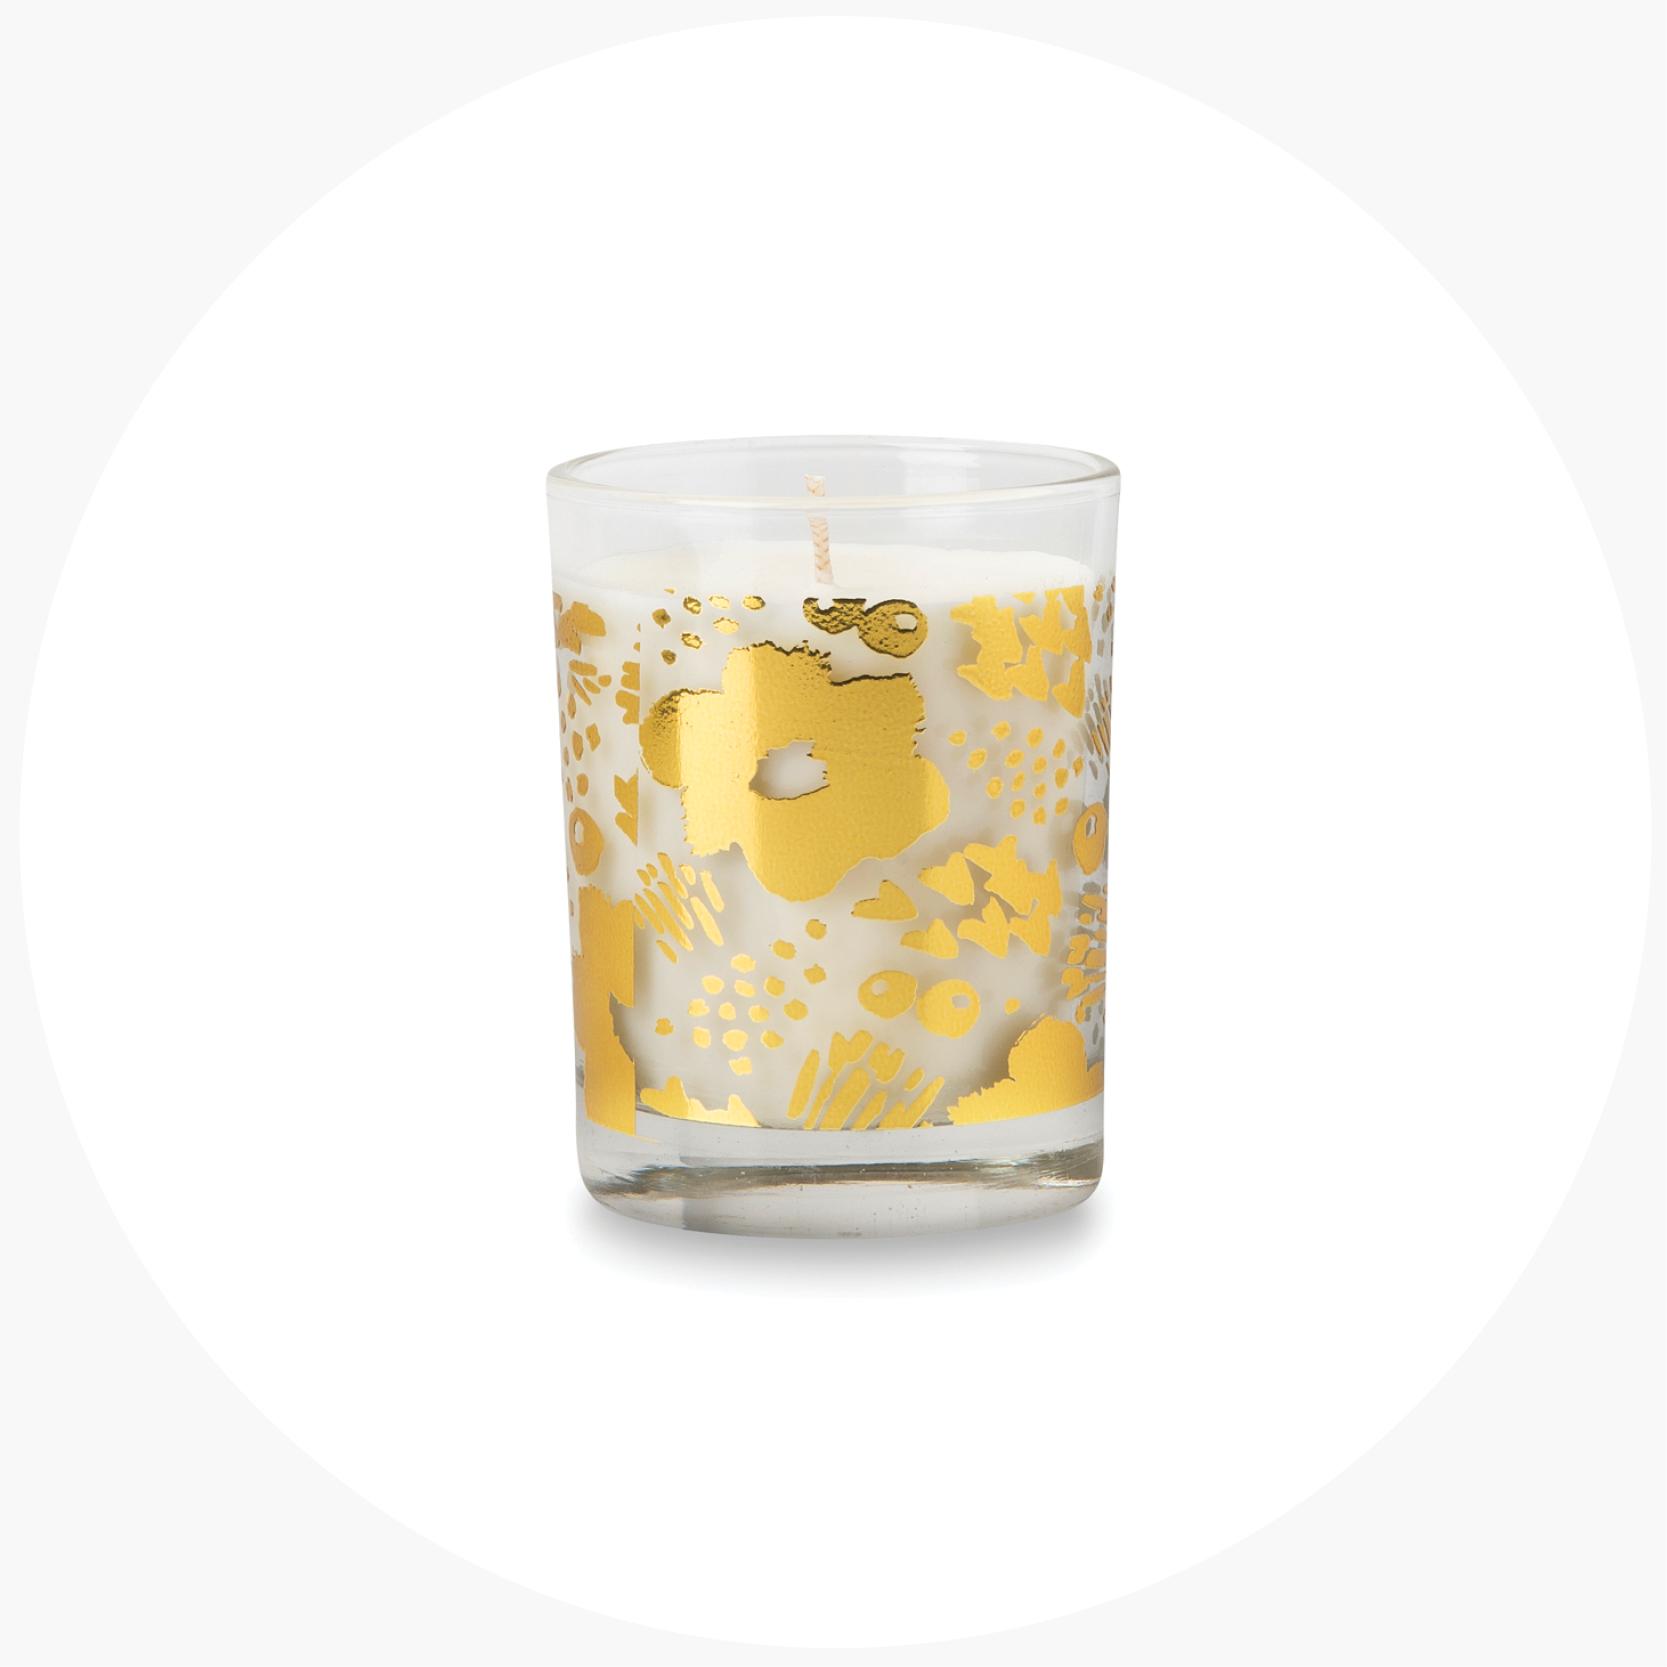 5  something smelly  .  fig leaf soy candle $29.90